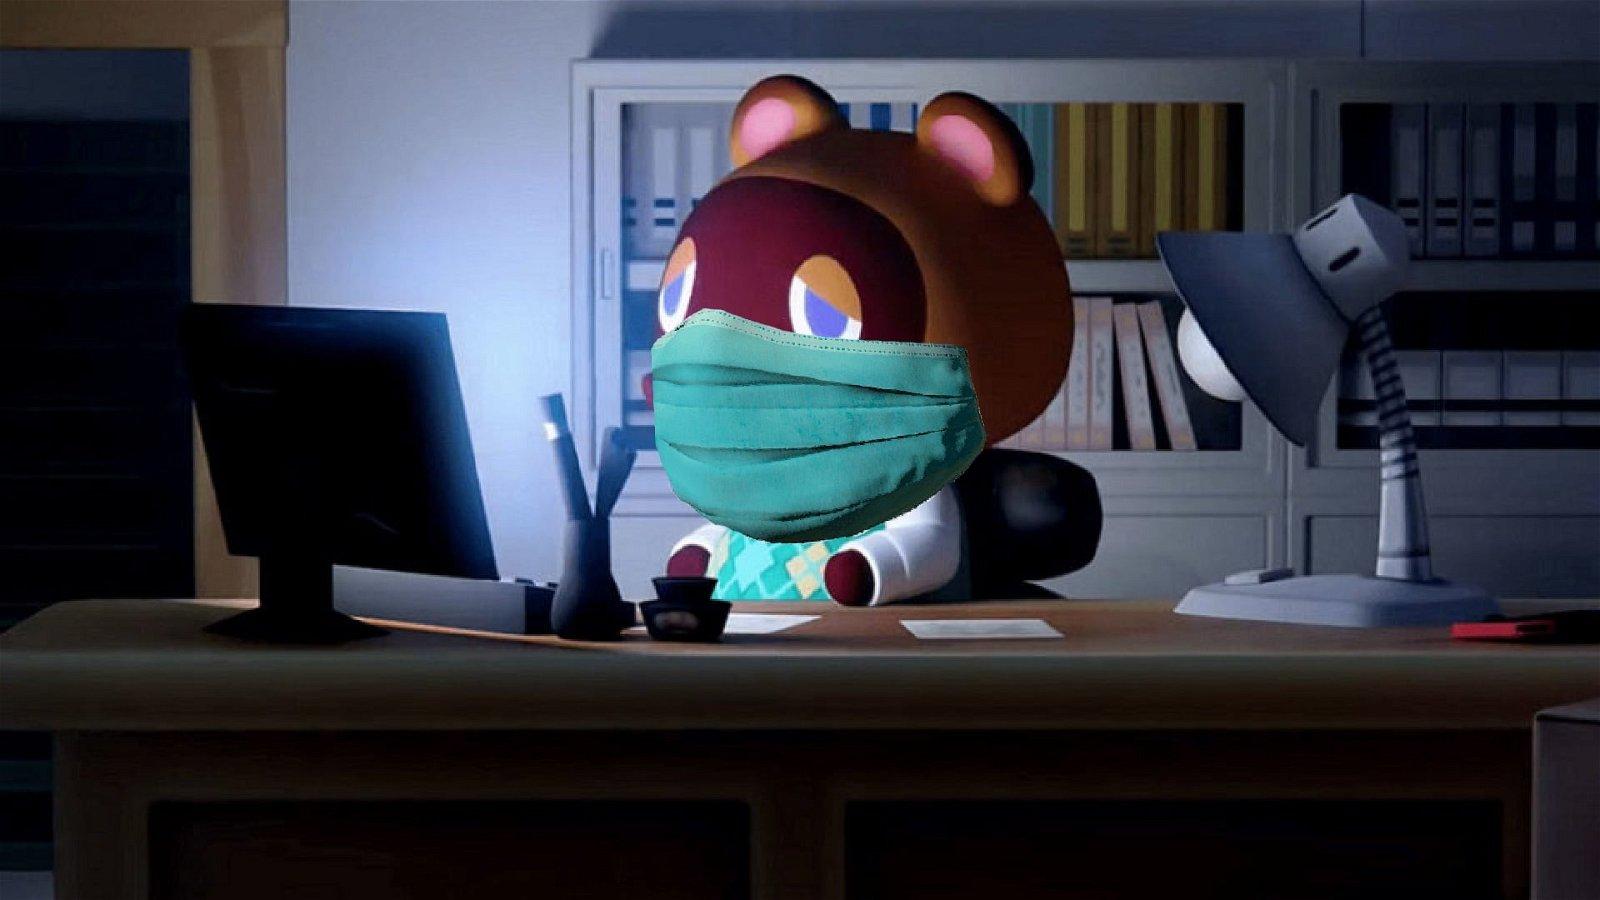 Animal Crossing: New Horizon Players Are Terrified of Sneezing Emote 1